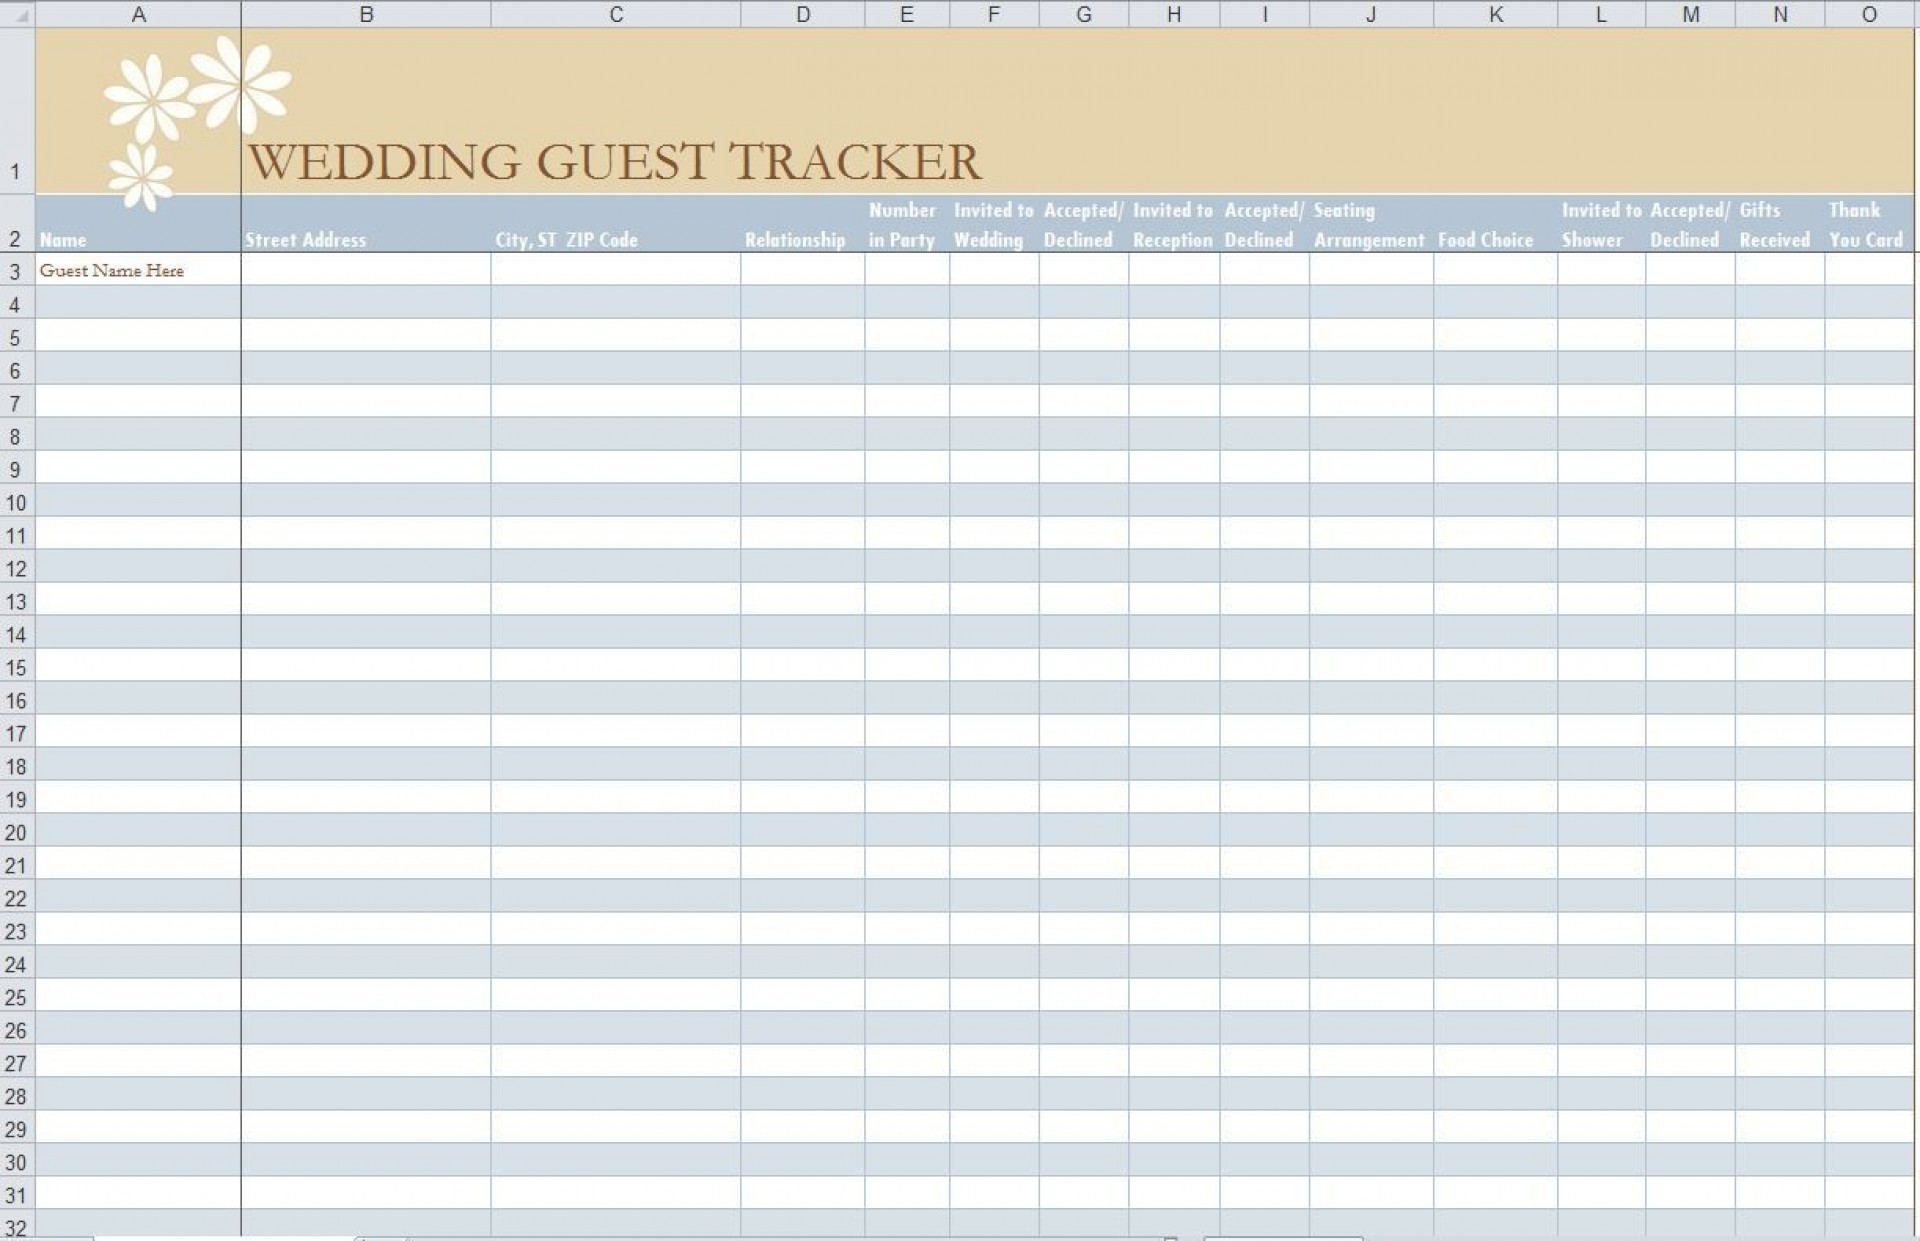 001 Impressive Wedding Guest List Template Excel Download Idea 1920